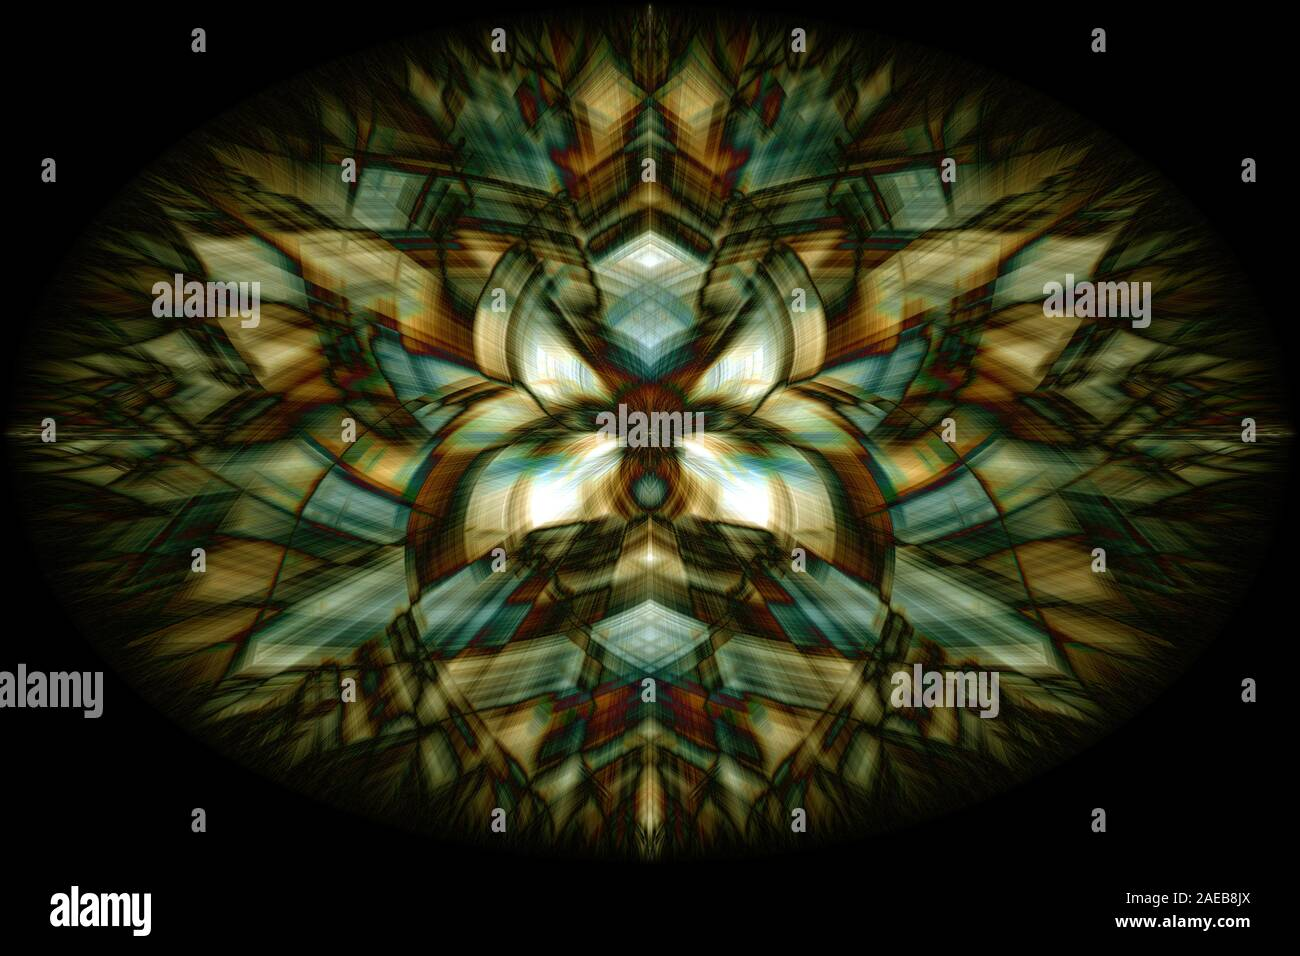 Abstract Colorful Mandala Art Symmetrical Shape Beautiful